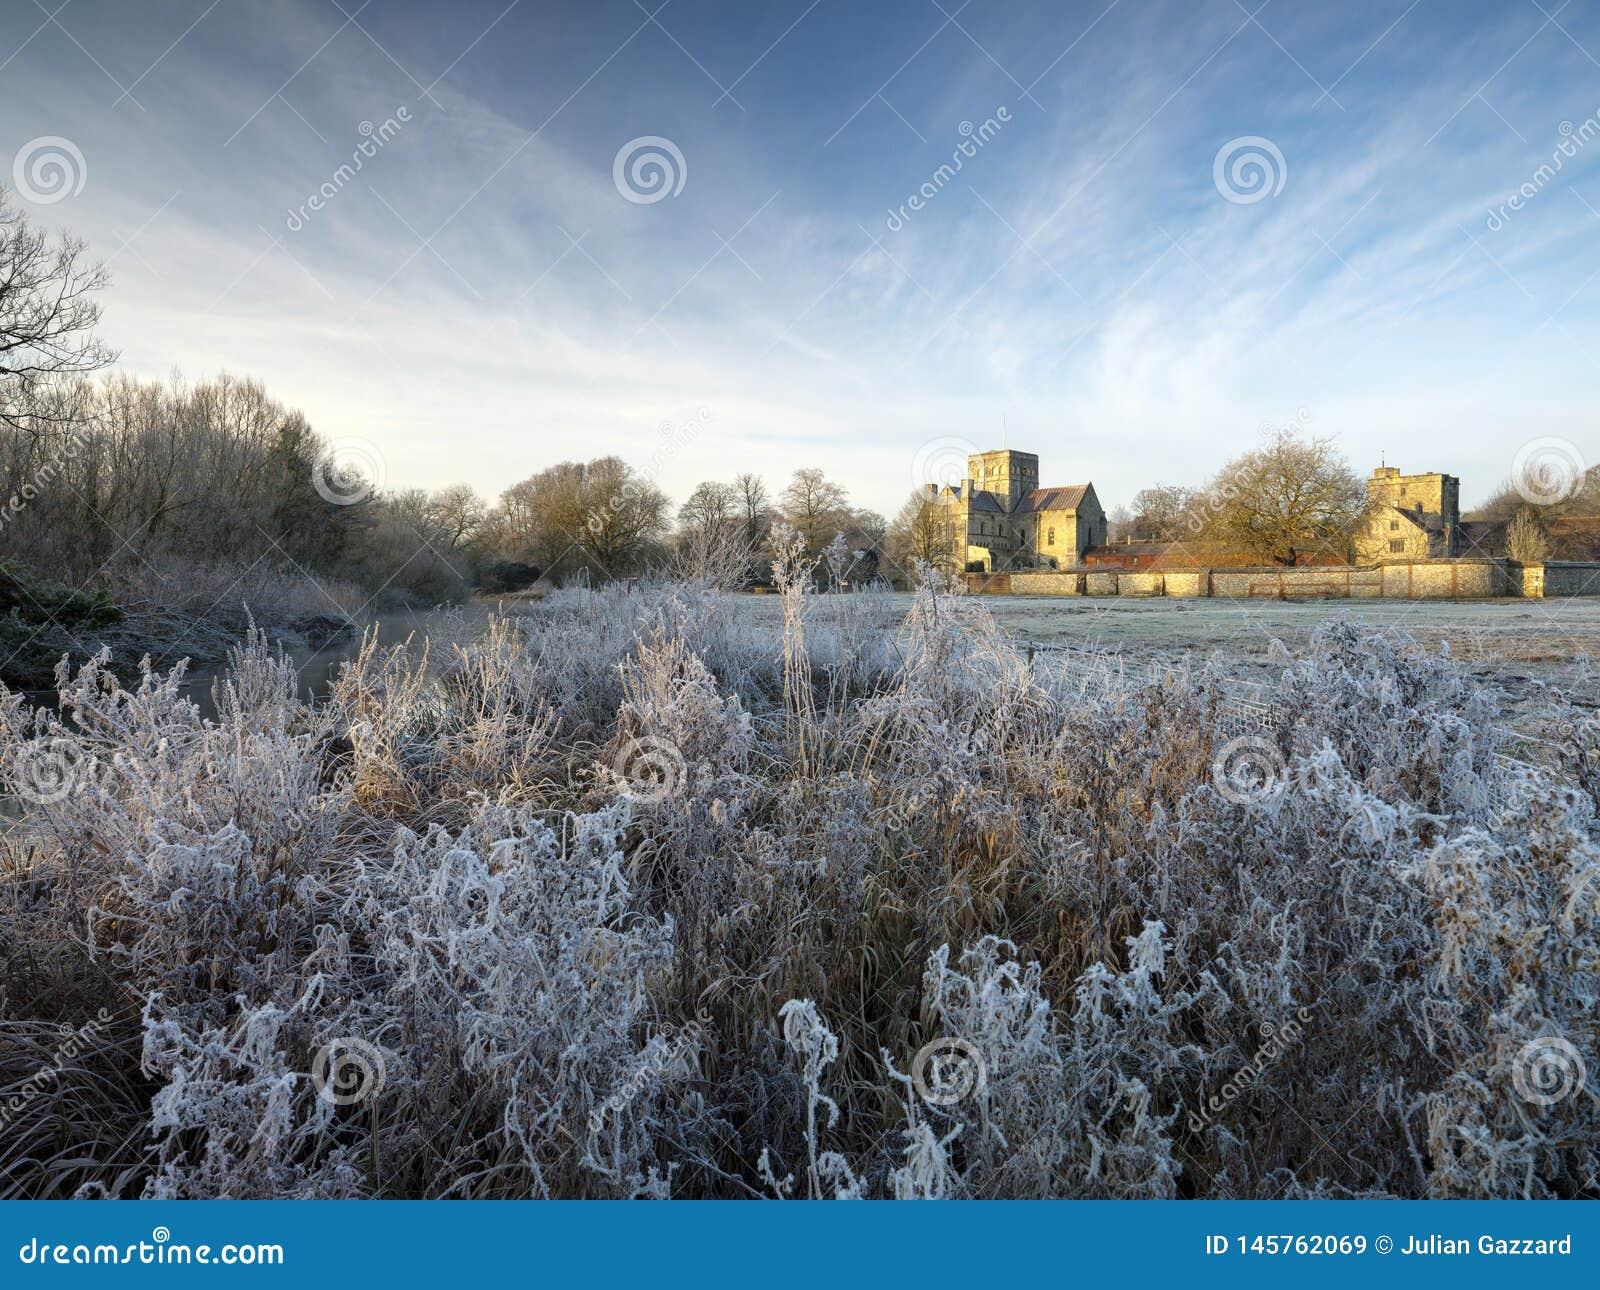 Frostig vintersoluppgång med en rimfrostsikt av St-korssjukhuset, Winchester, Hampshire, UK